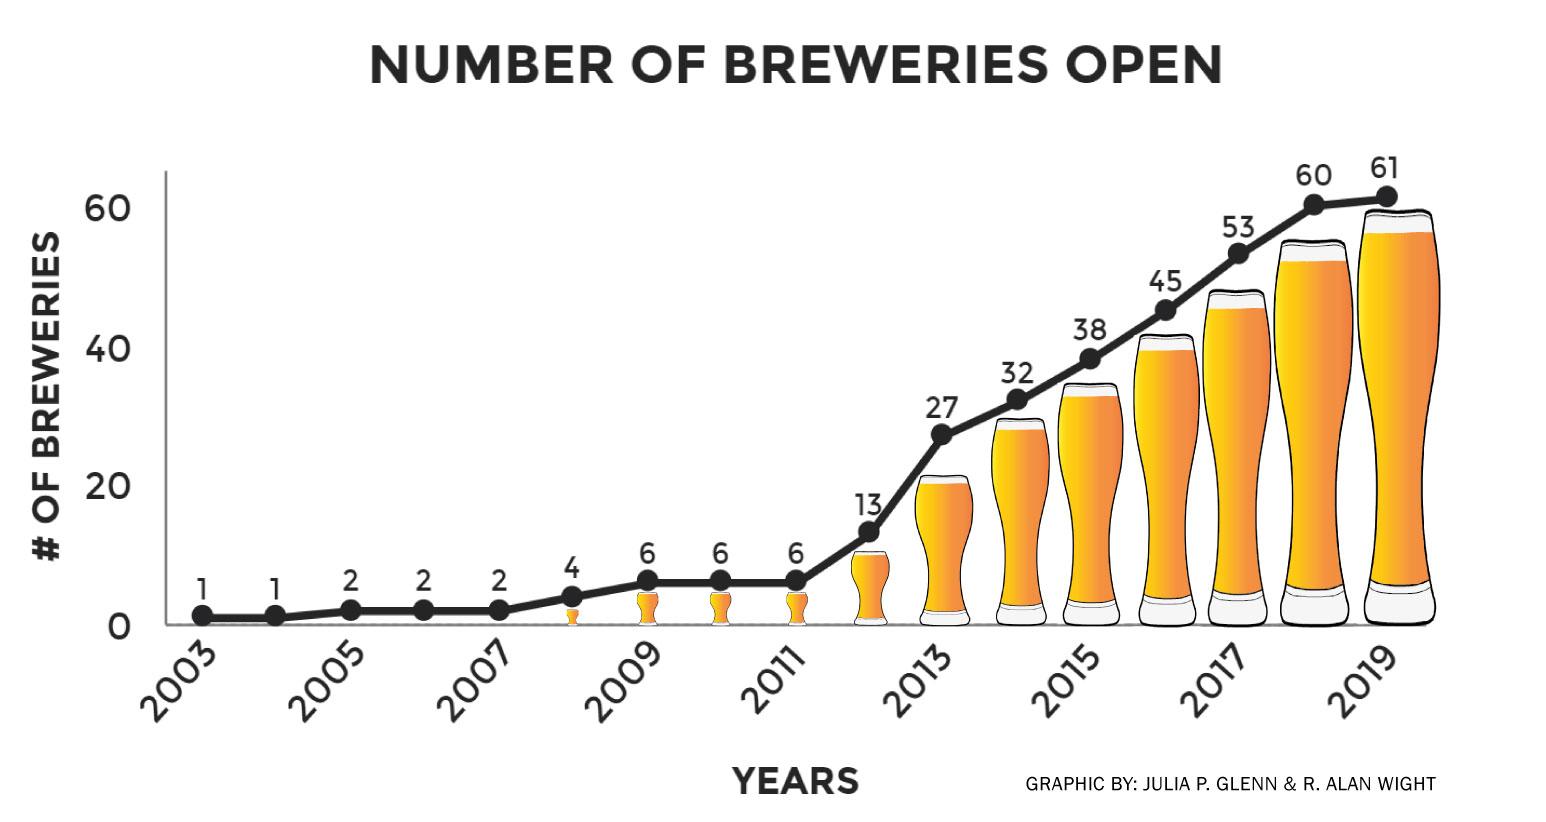 BreweriesOpenBarGraph.jpg